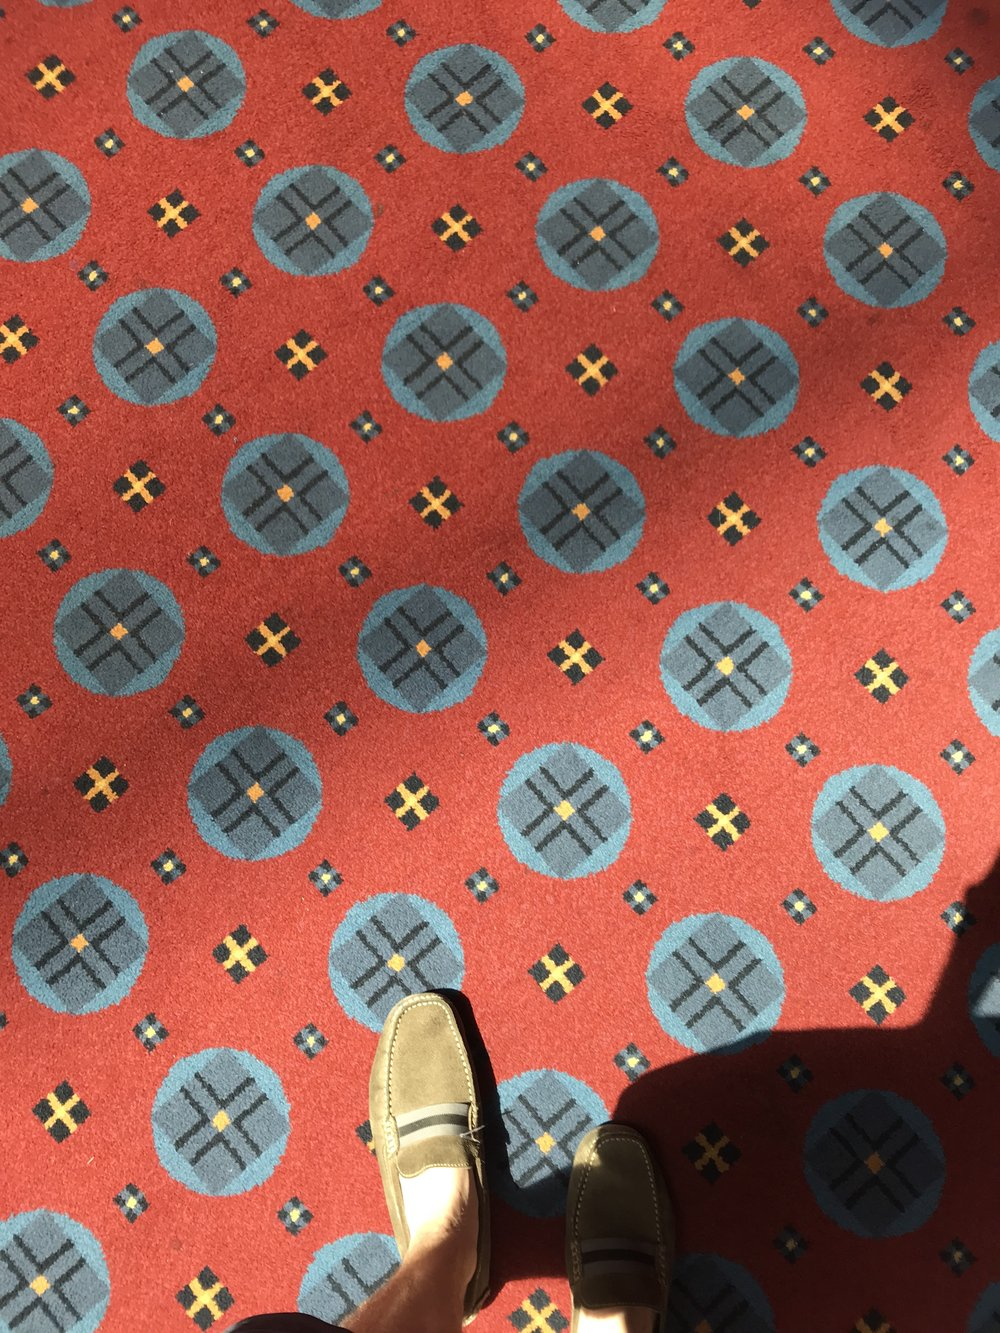 Vintage style carpet